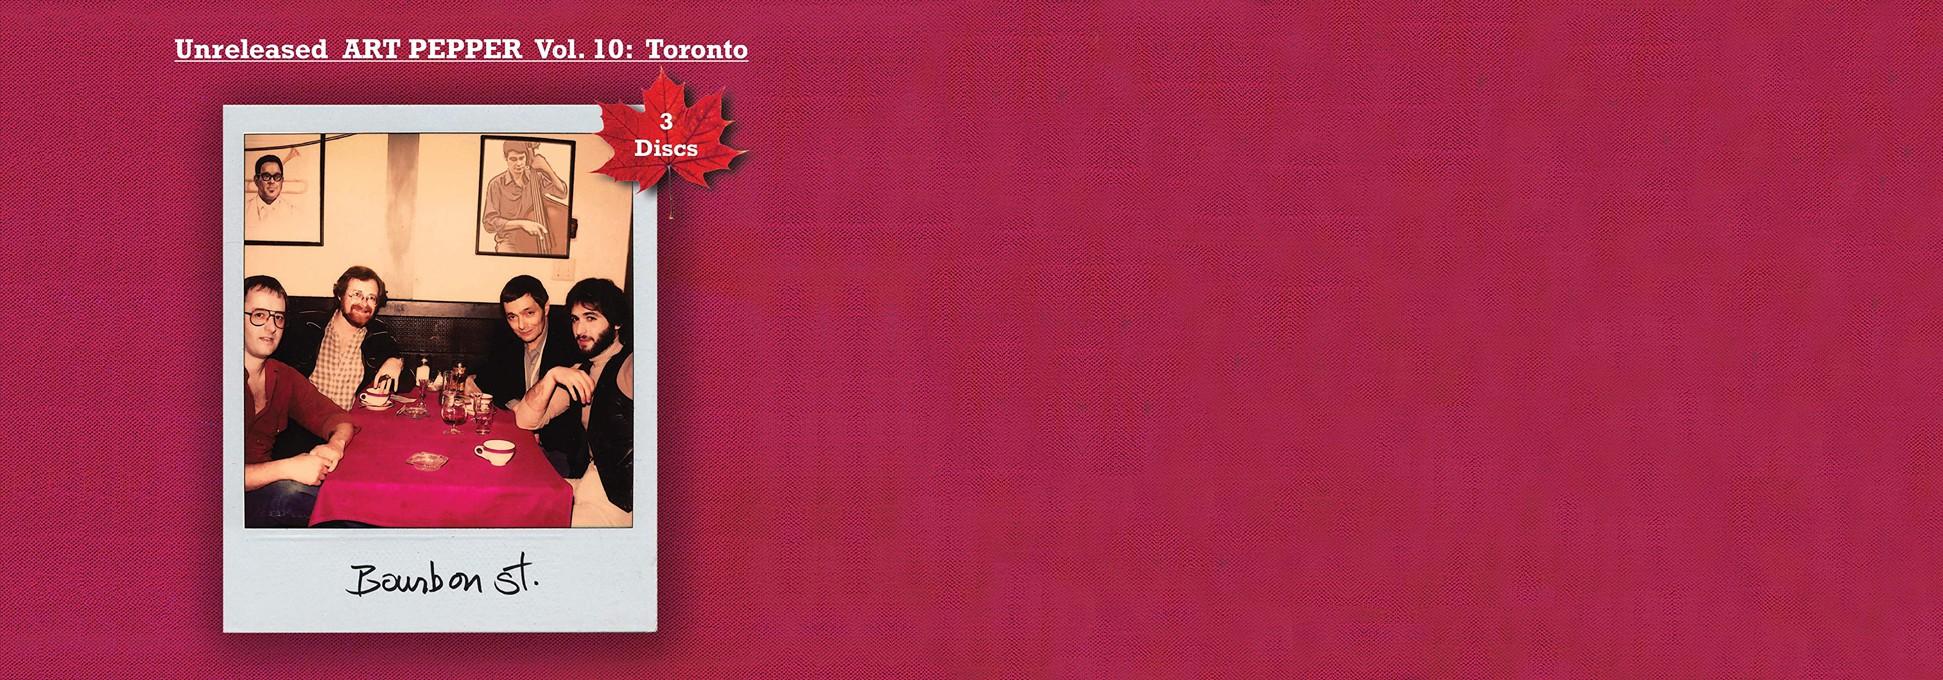 Art Pepper in Toronto